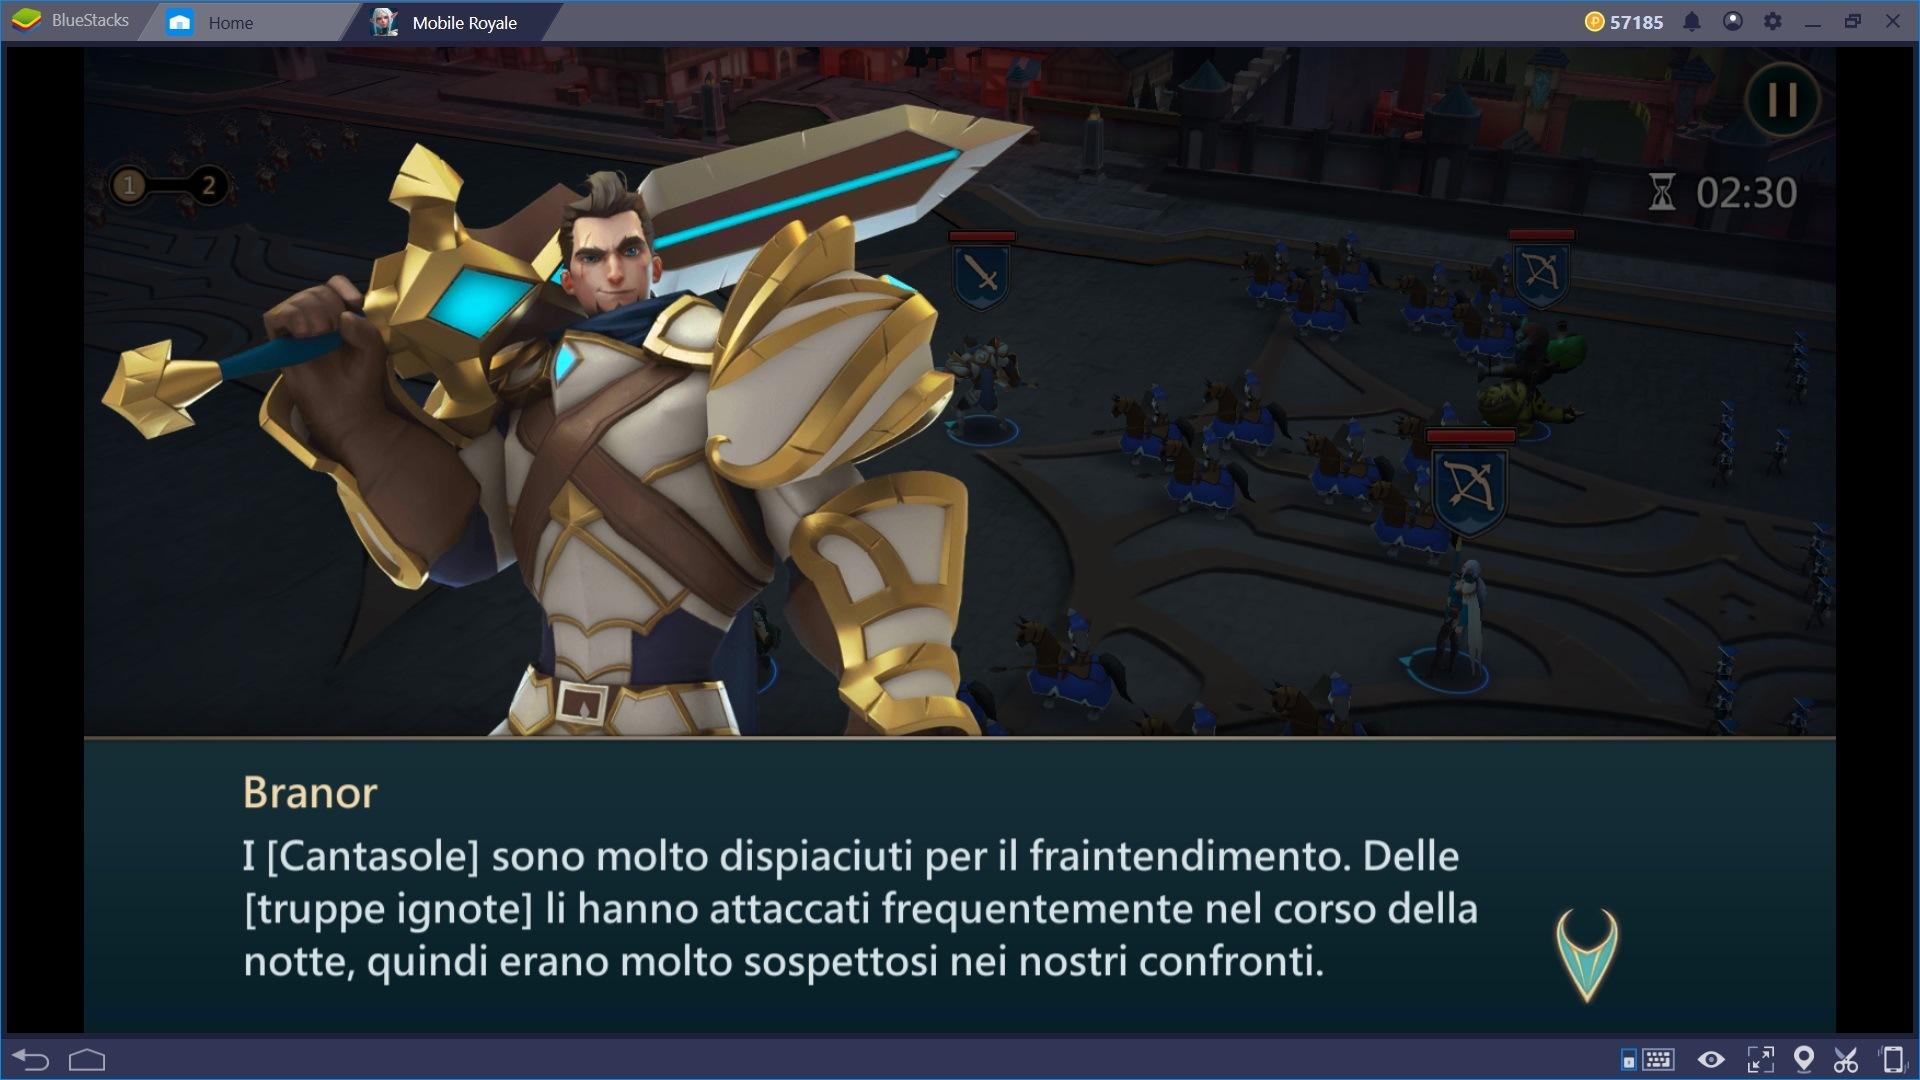 Mobile Royale: Guida agli Eroi